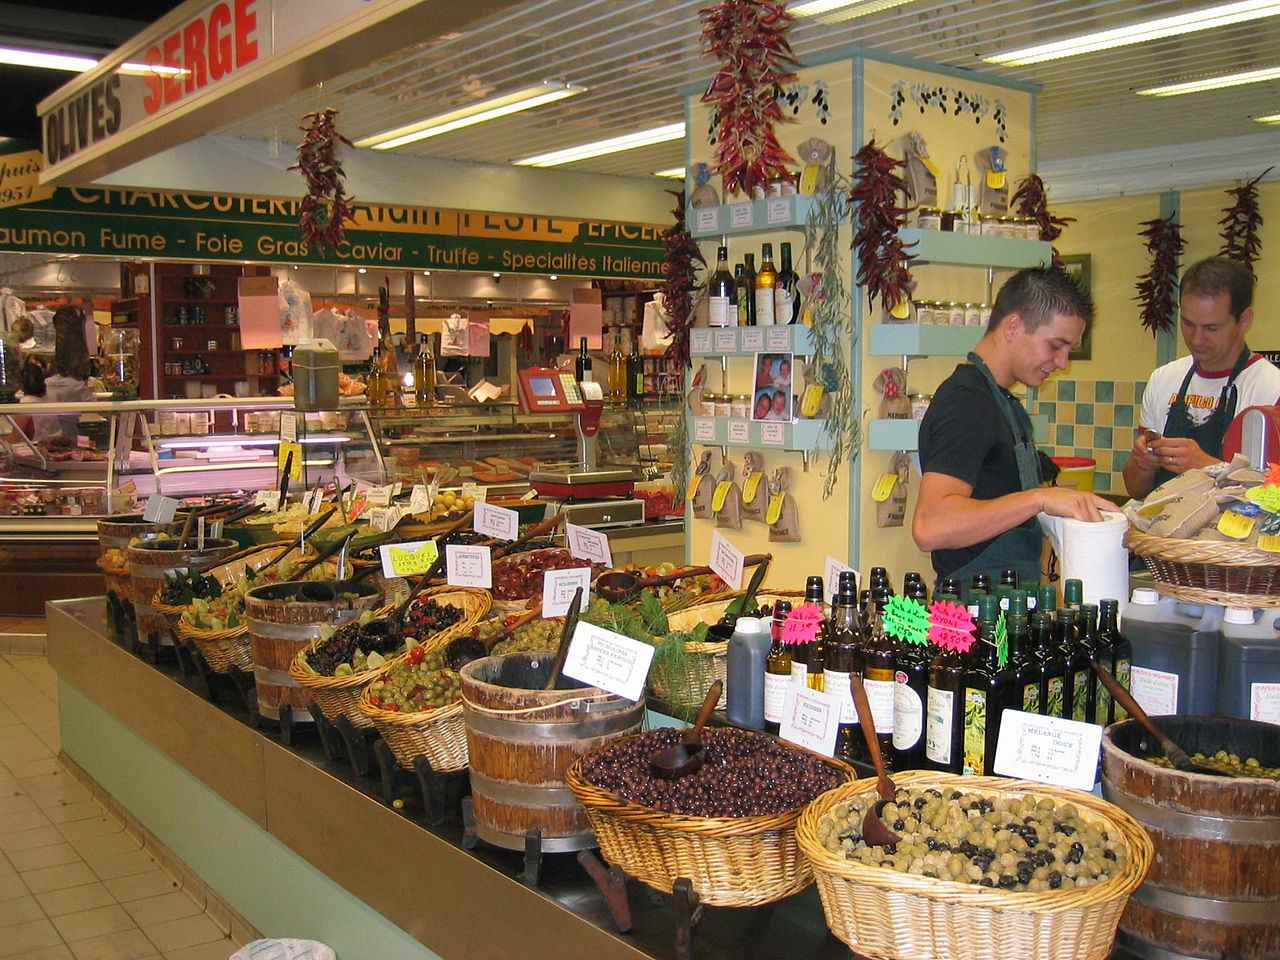 Olive Stall in market hall, Avignon